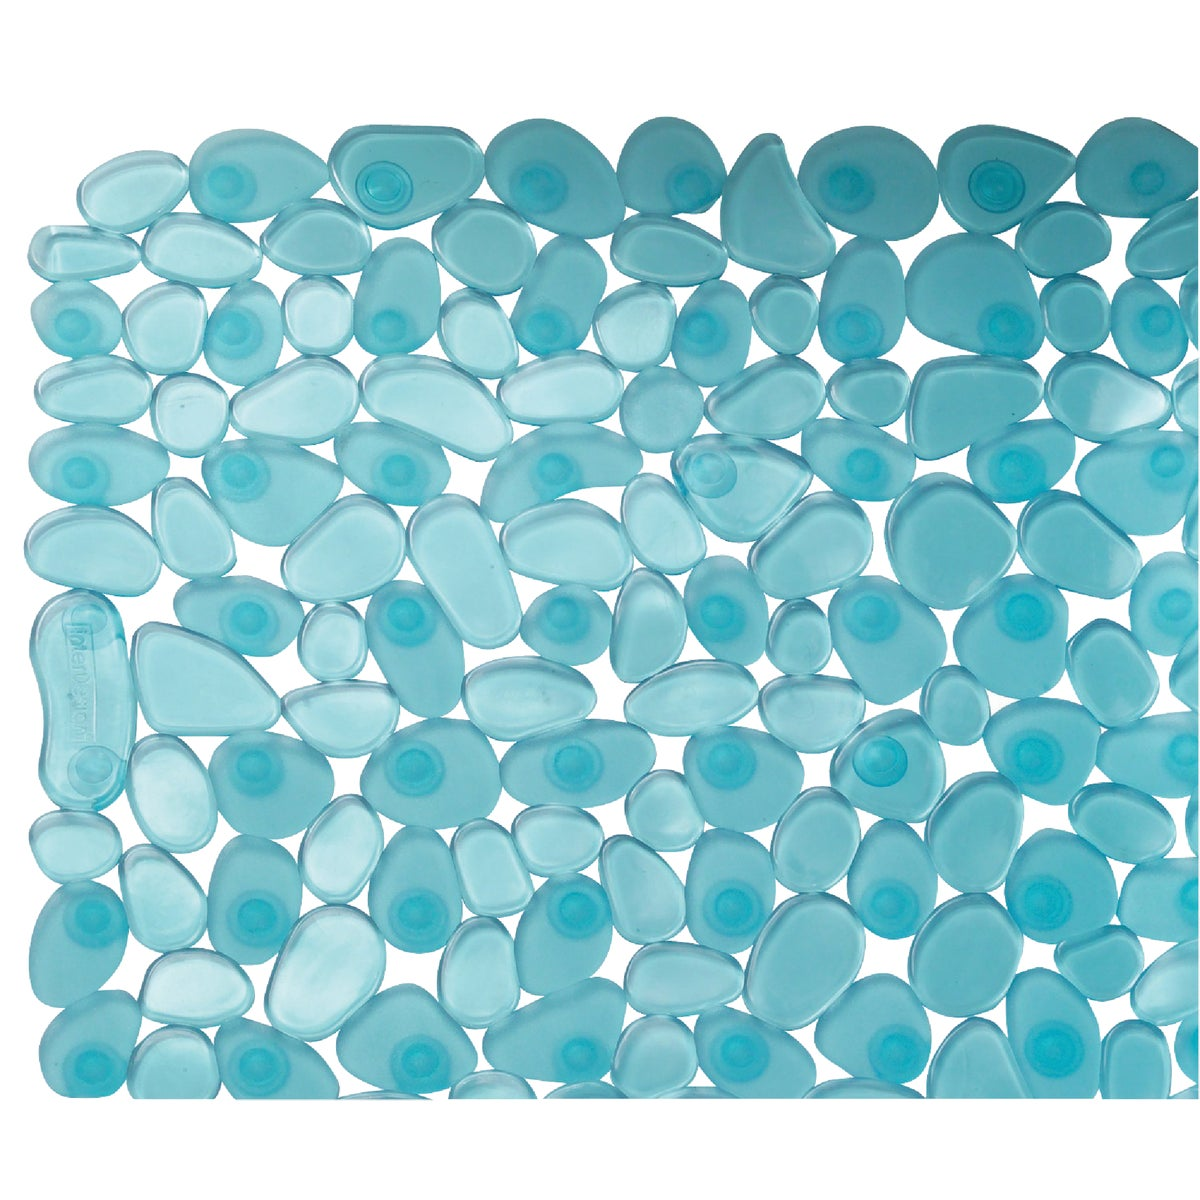 BLUE PEBBLZ BATH MAT